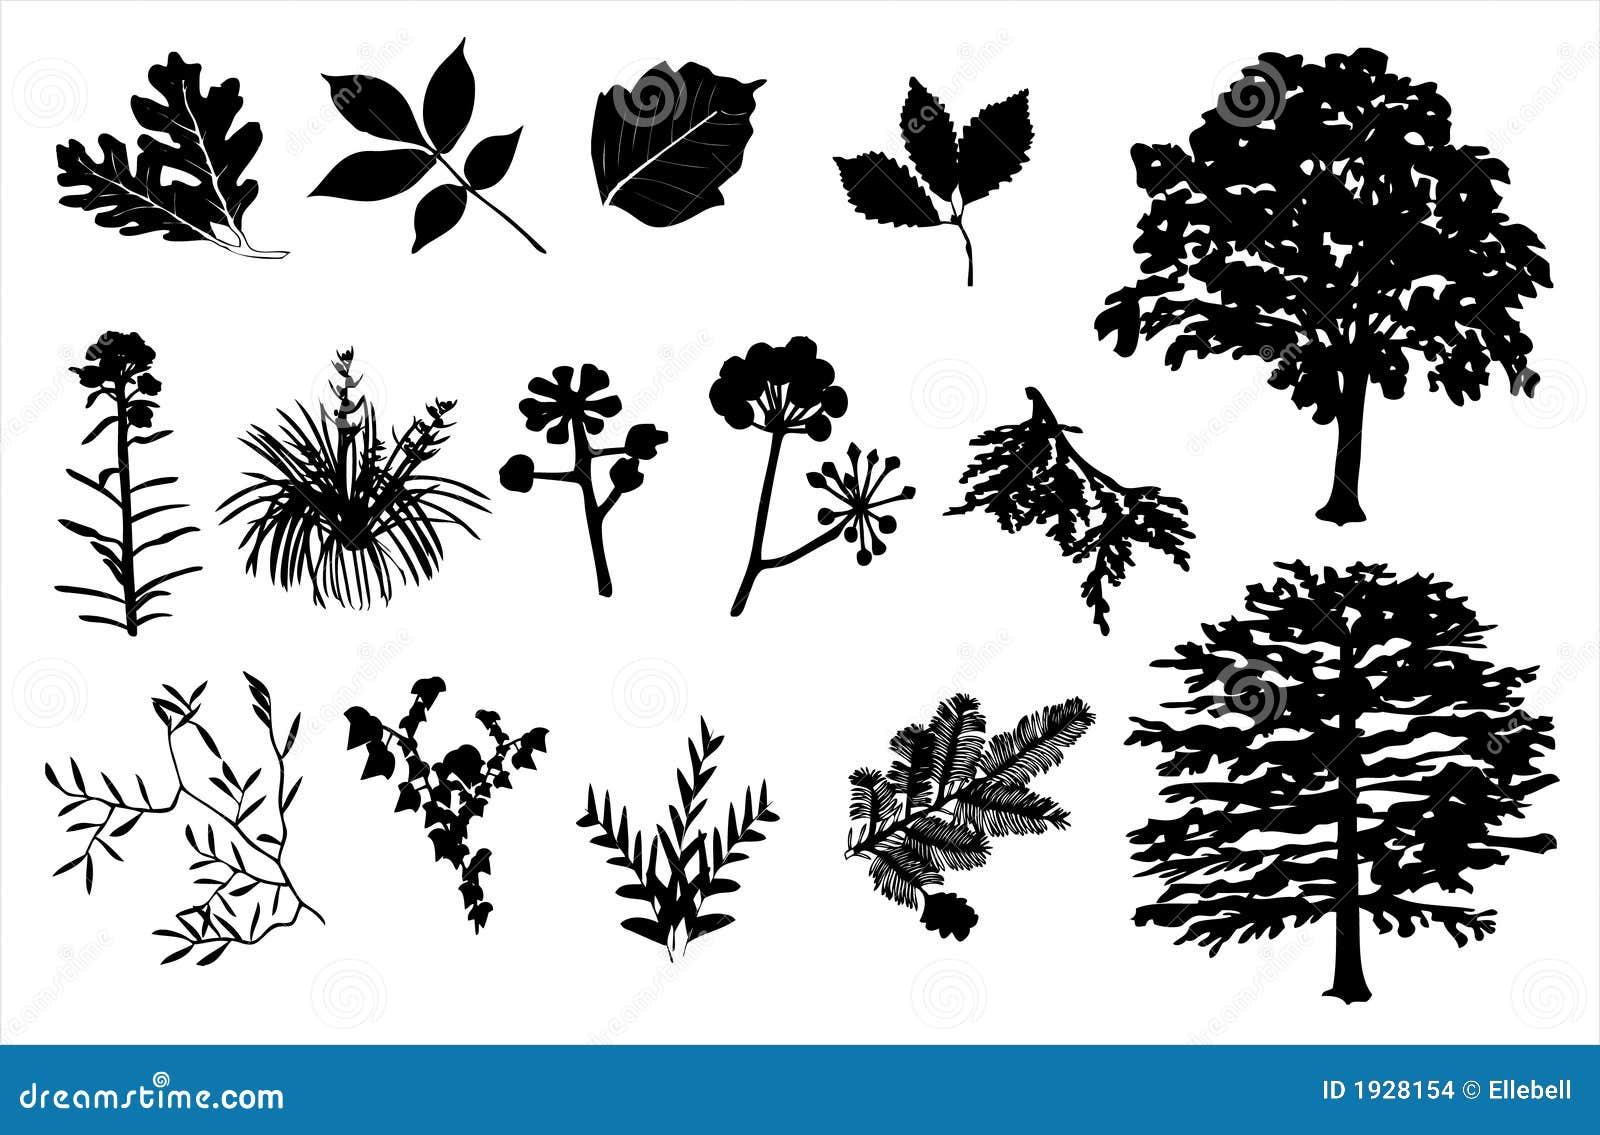 Foliage Silhouette Set Stock Vector Illustration Of